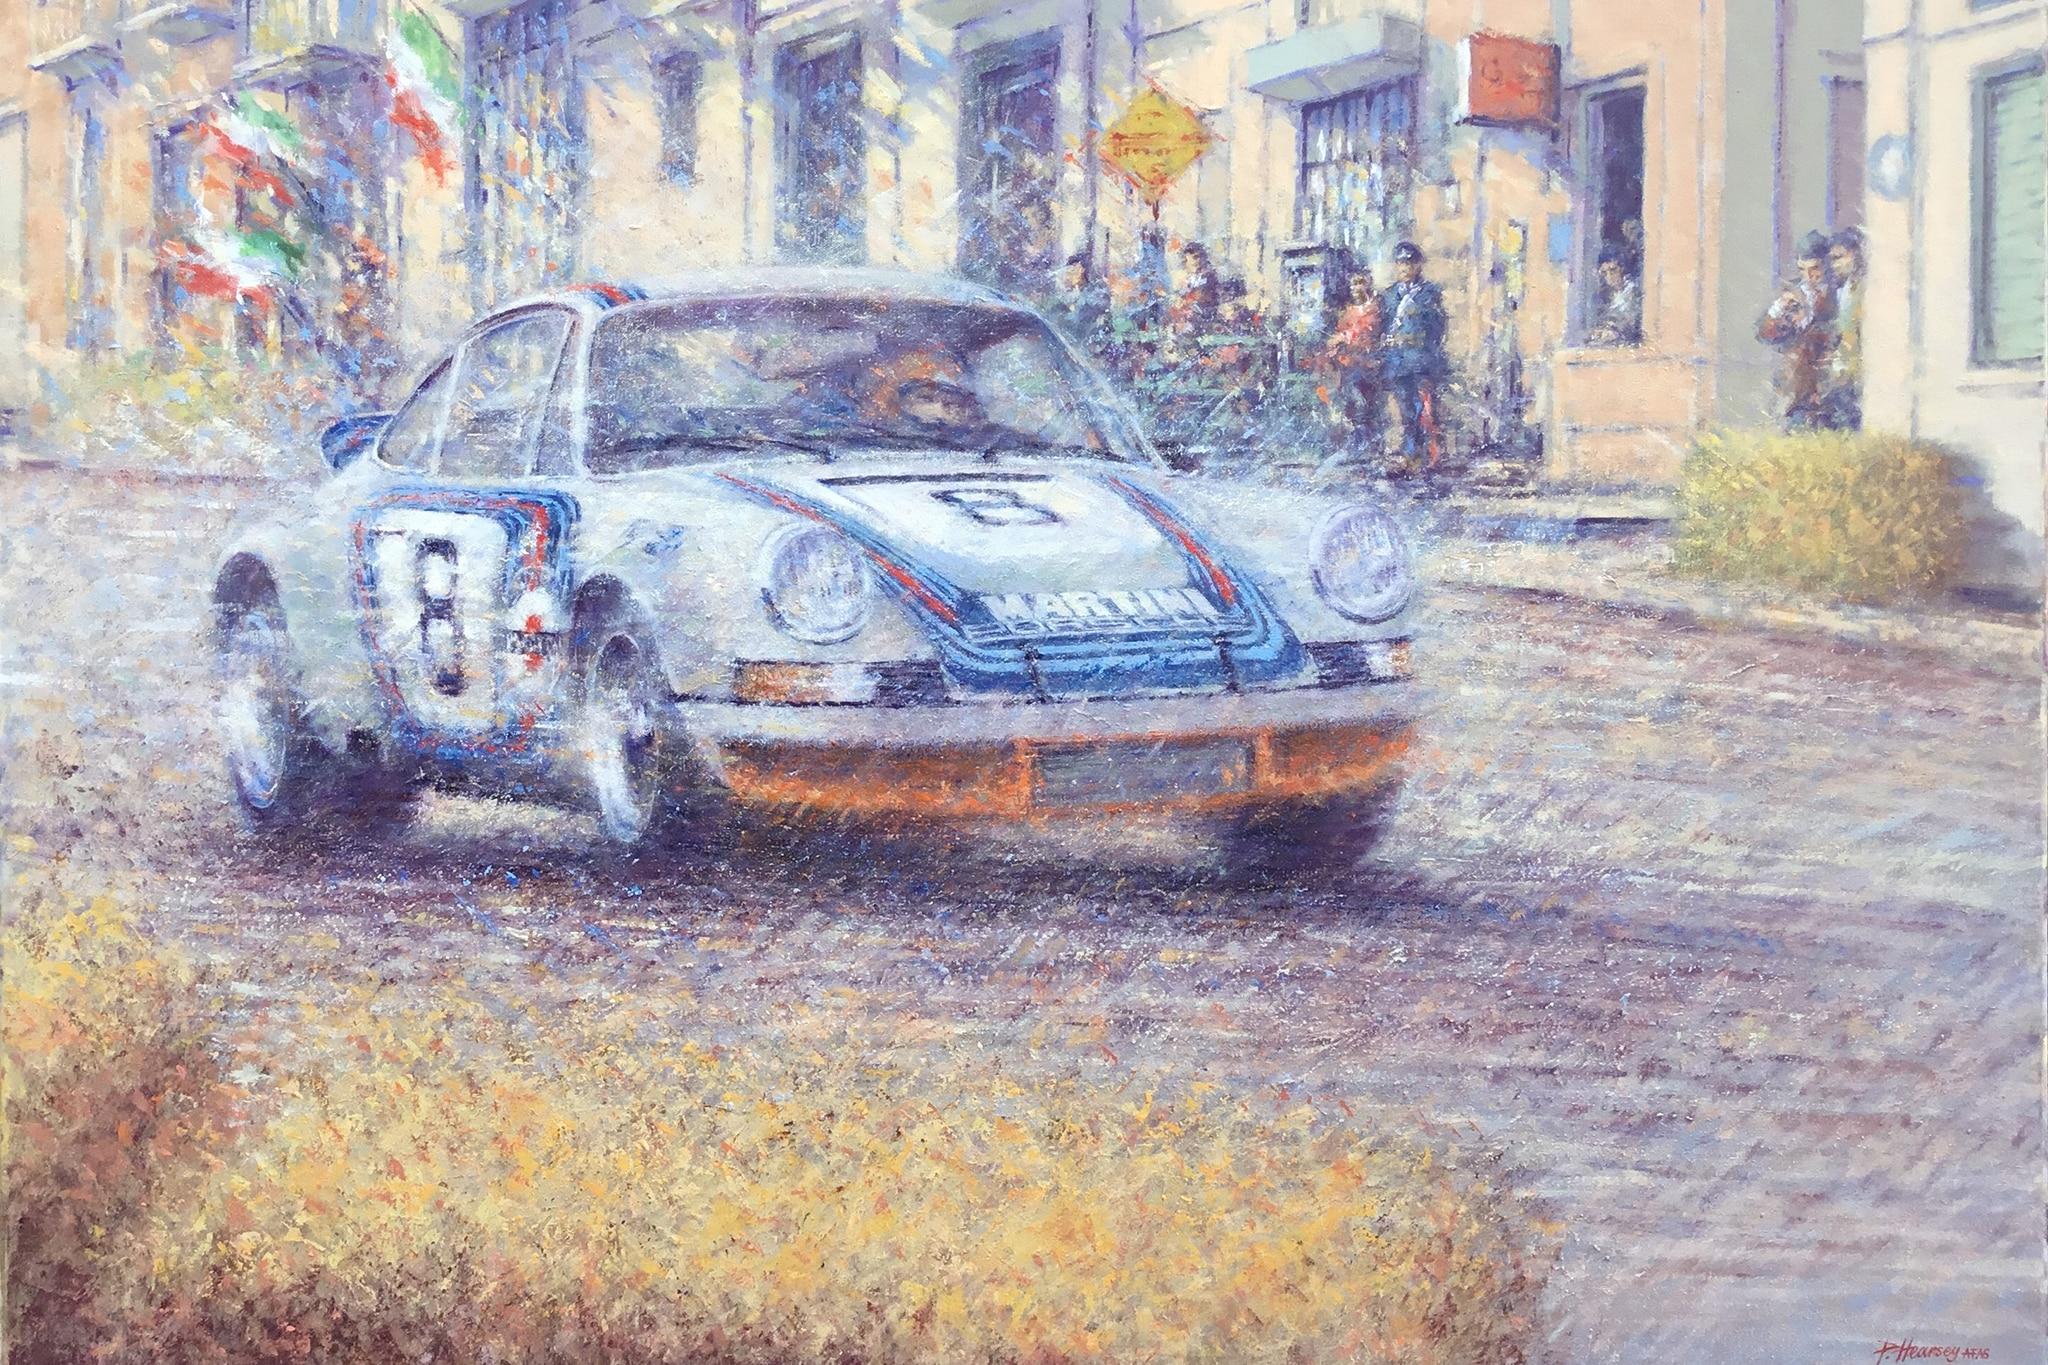 Porsche 911 Carrera RSR By Peter Hearsey